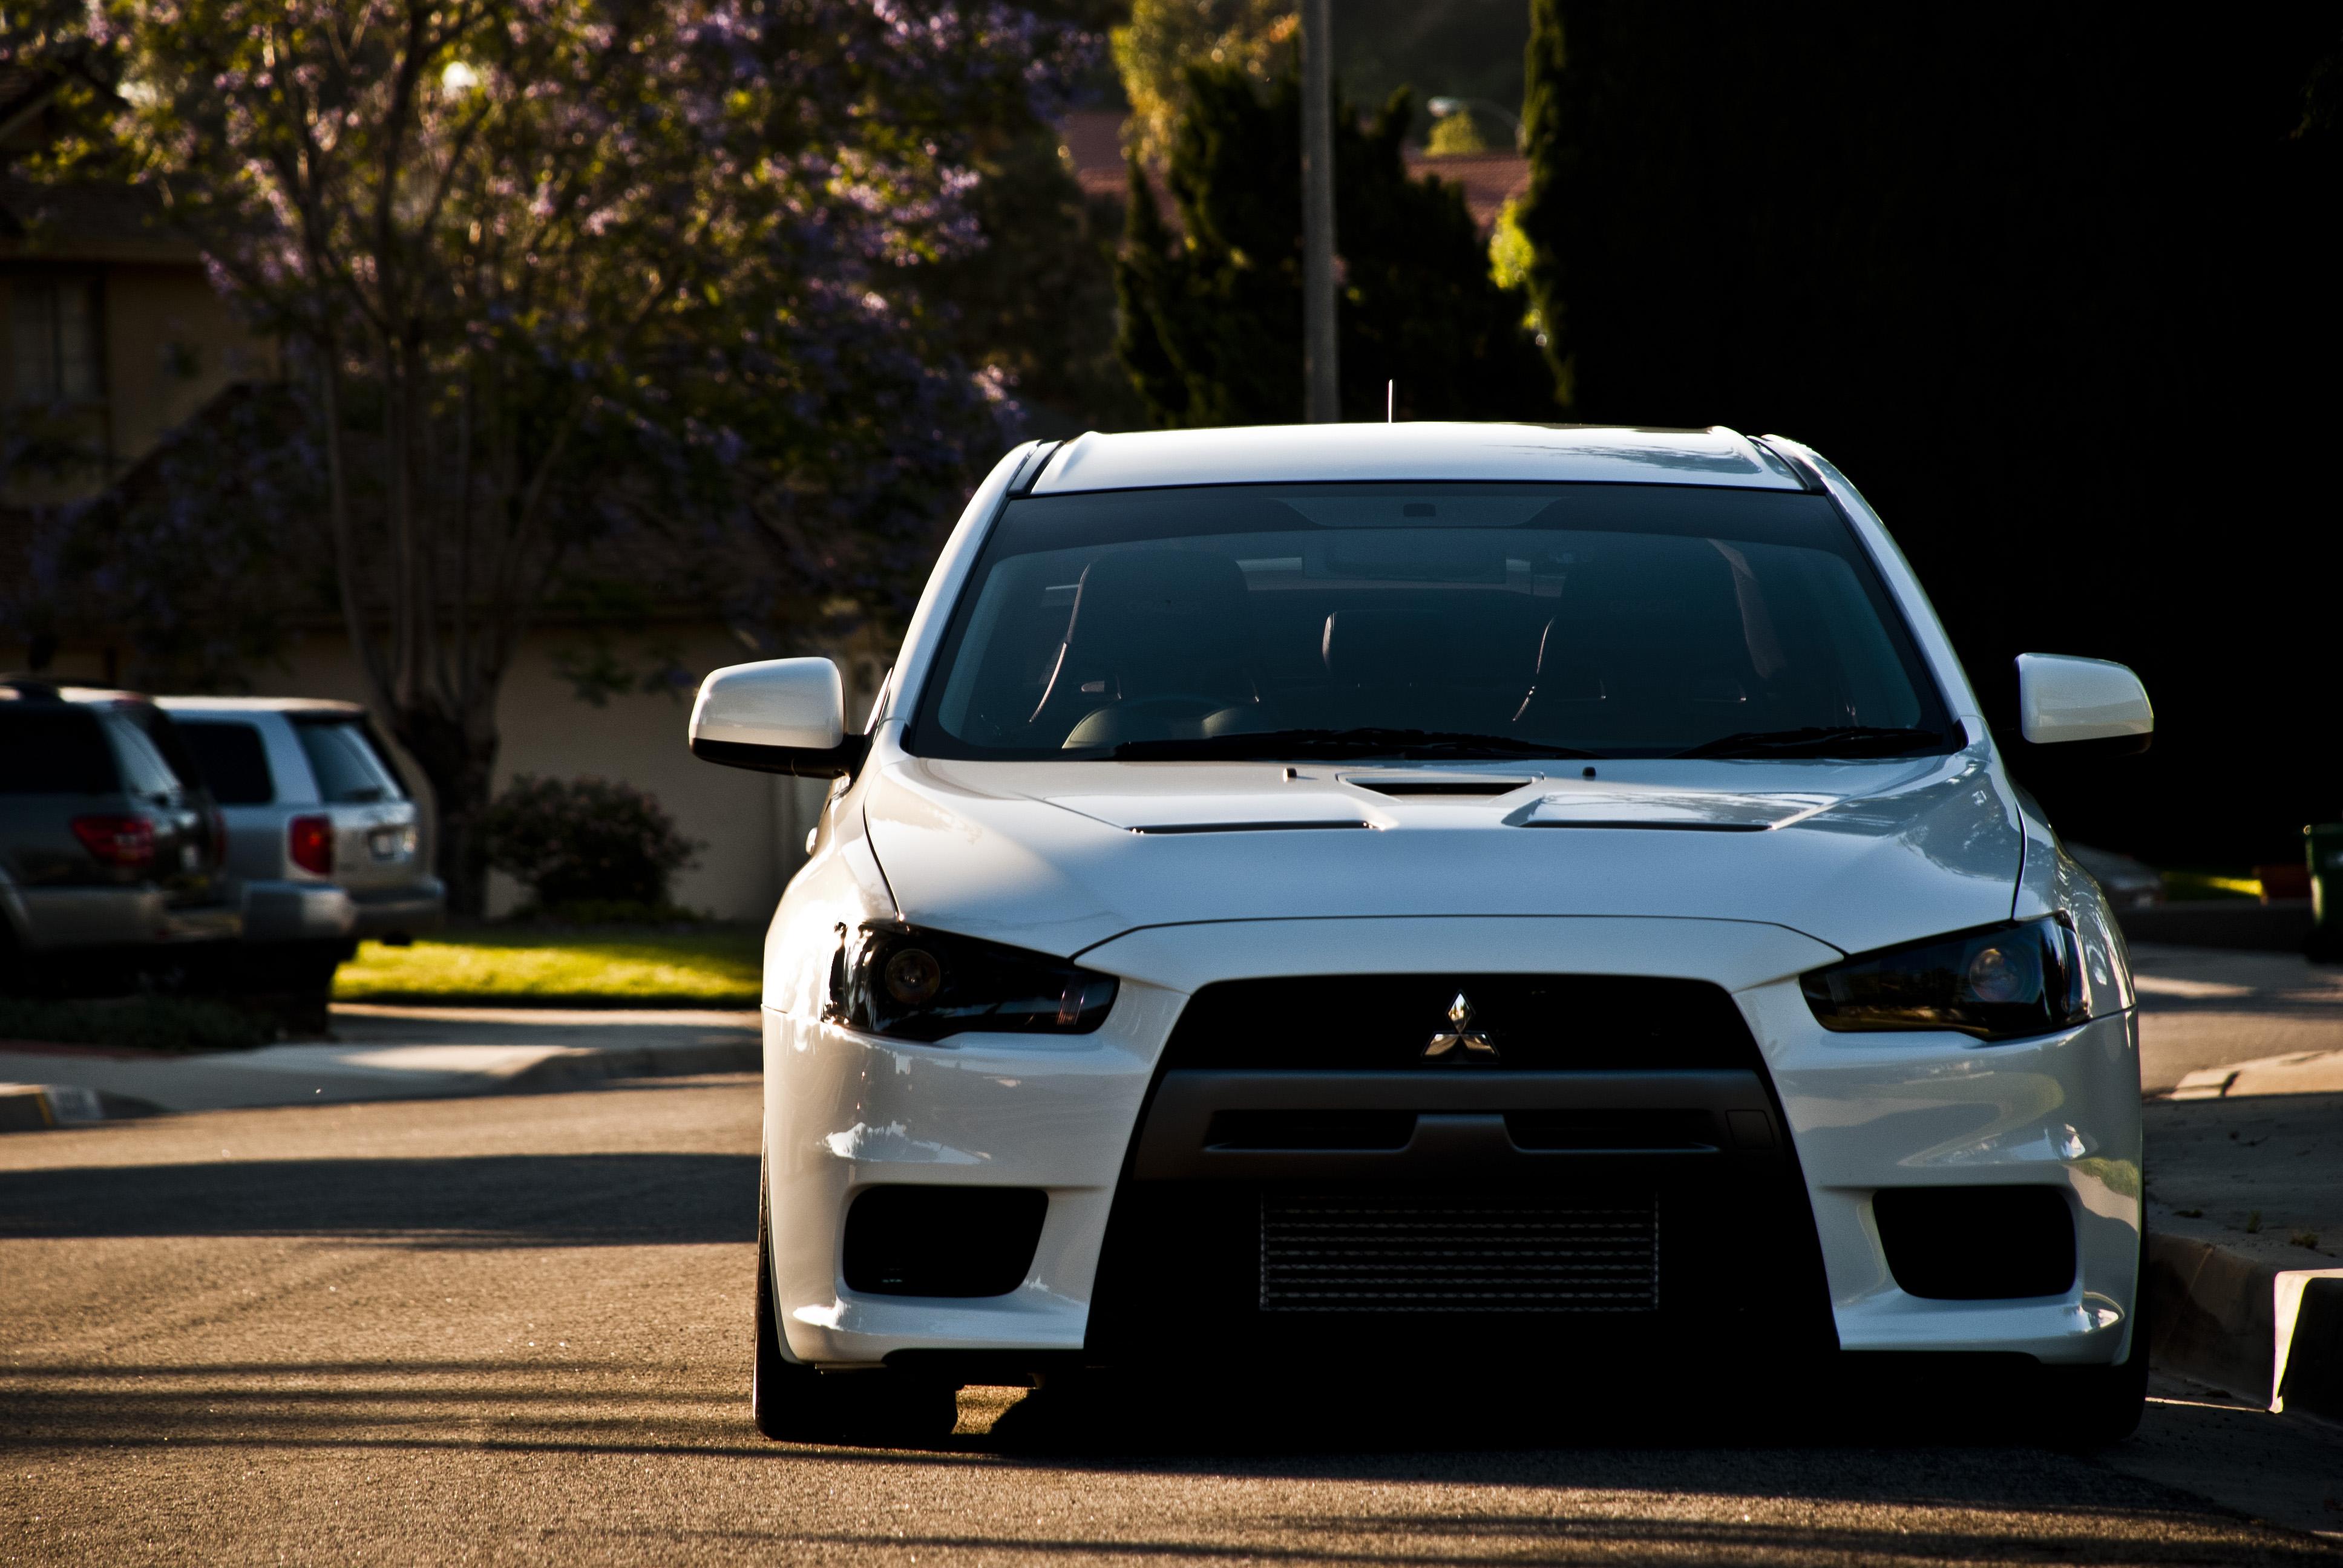 report this image - Mitsubishi Evo X Wicked White